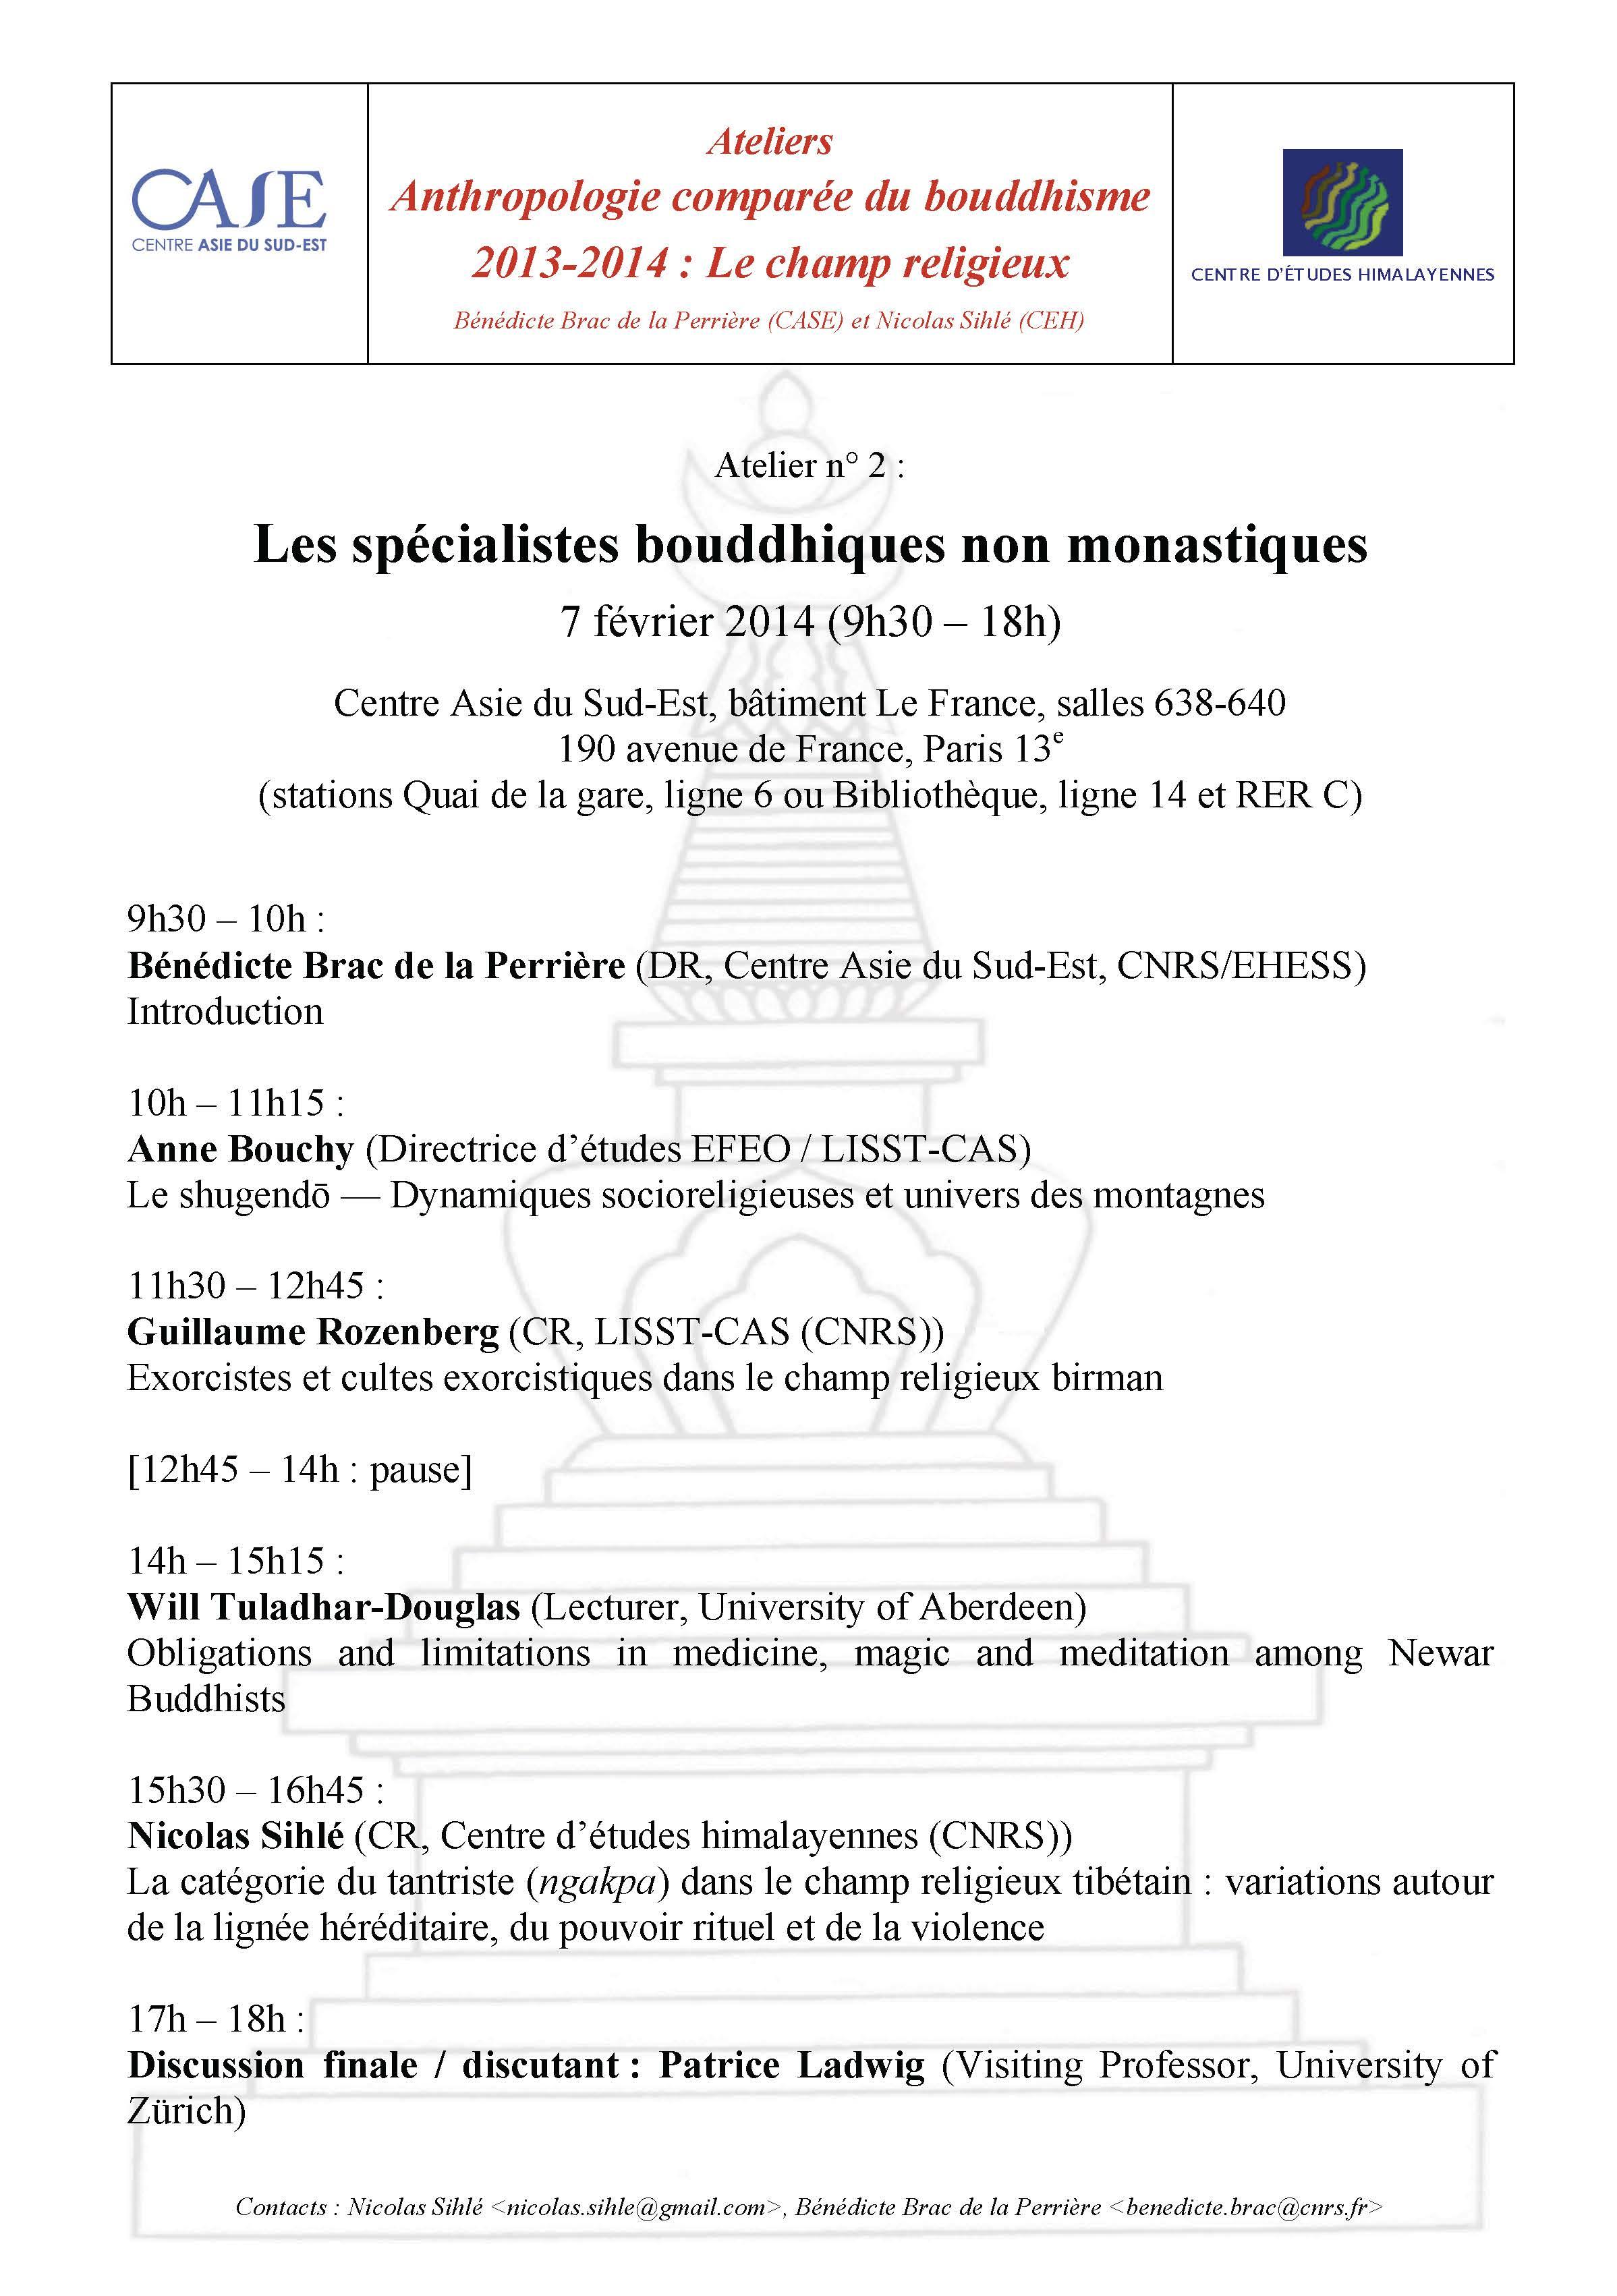 ProgrammeAtelier2.2_SpecialistesNonMonastiques_affiche